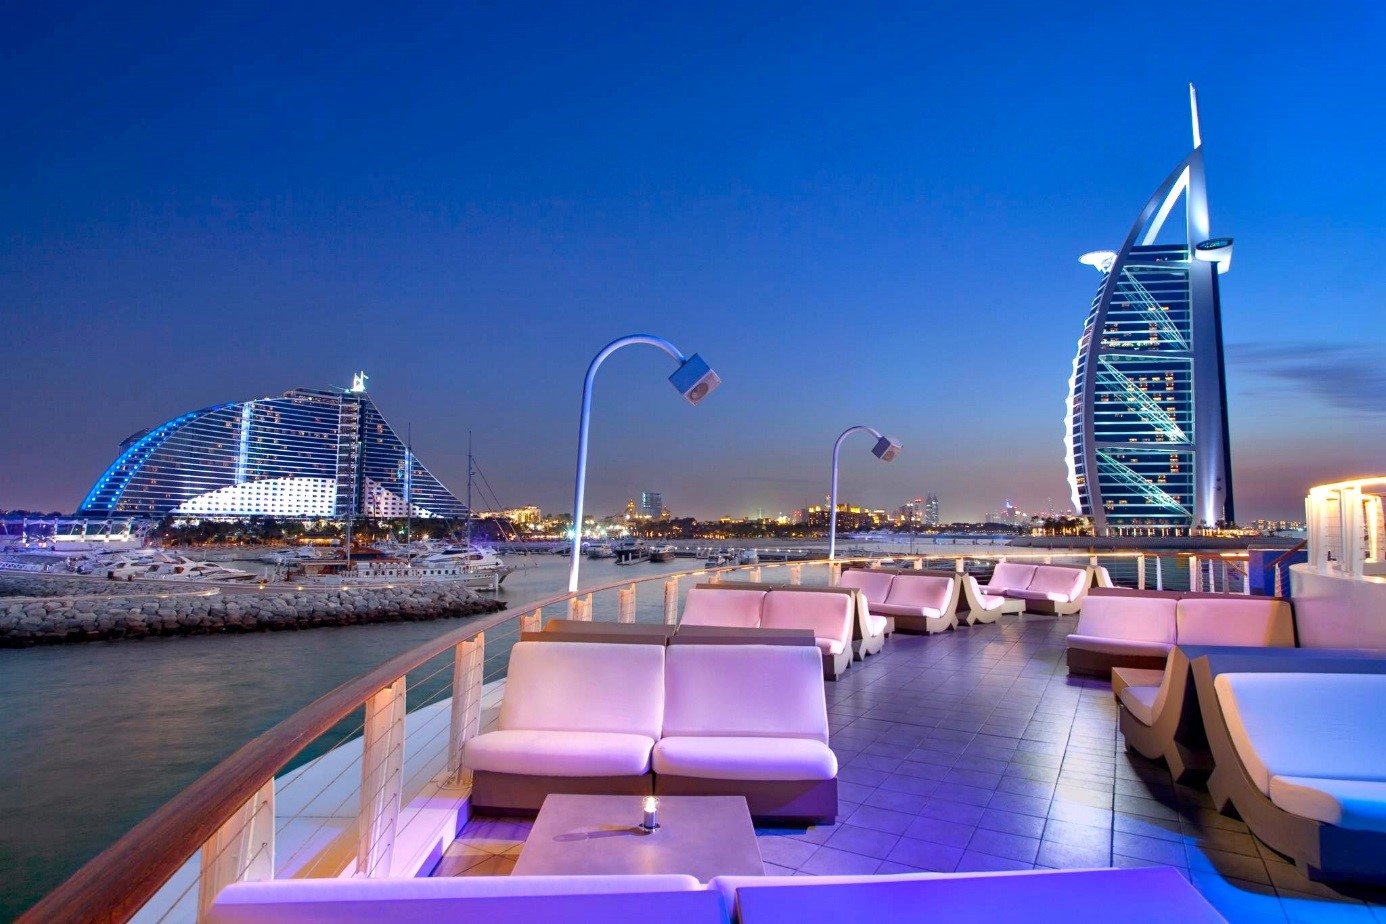 Dubai hotel zimmer bis 2020 for Top 100 hotels in dubai